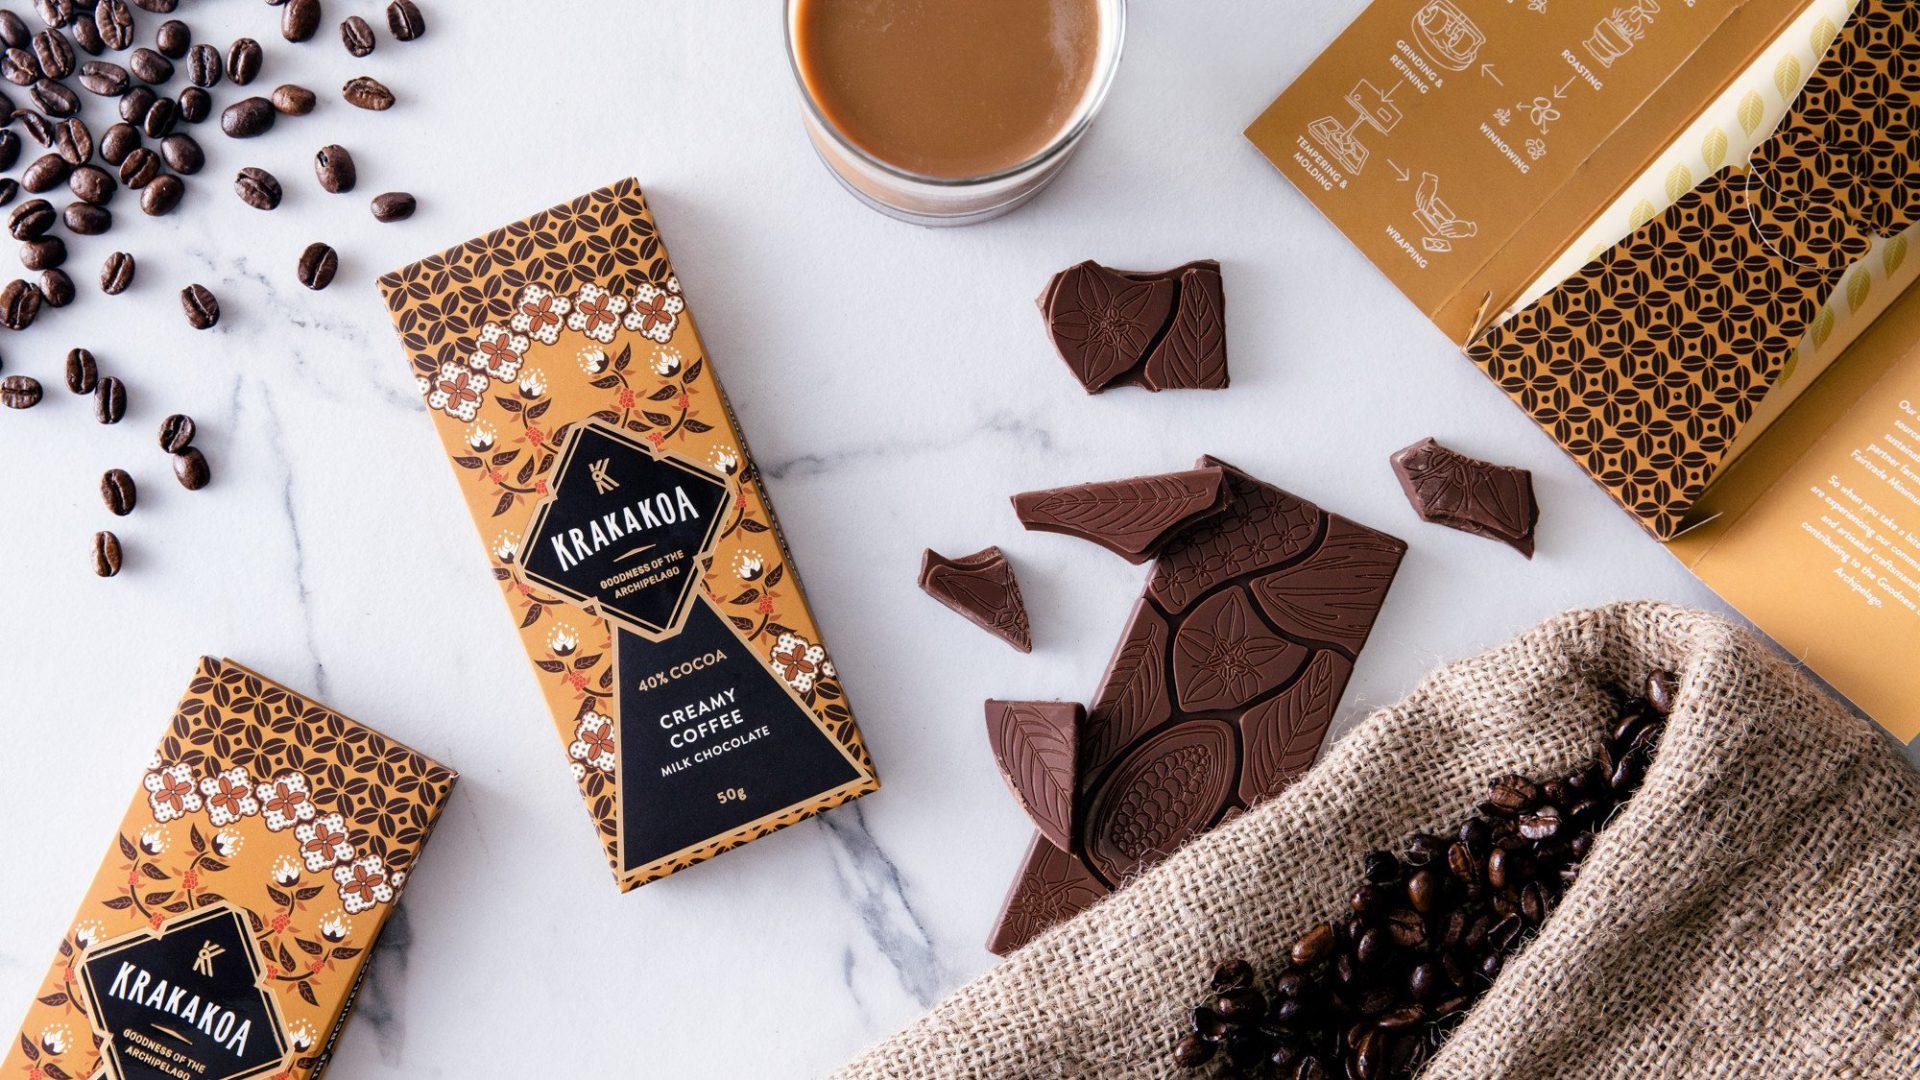 Krakakoa Beans to Bars artisanal chocolate